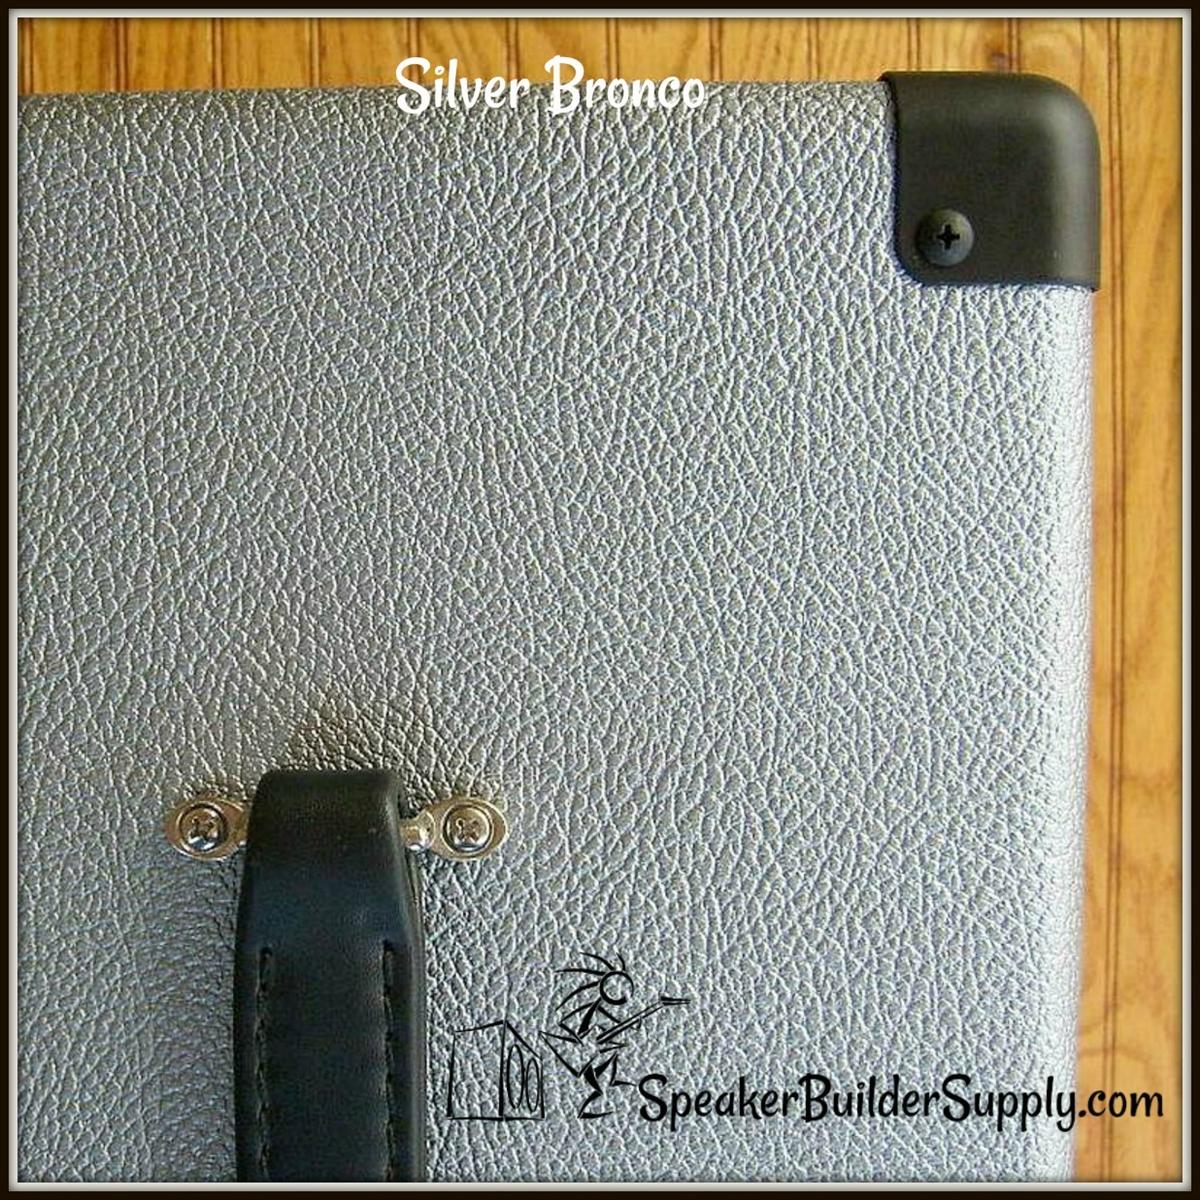 Silver Bronco tolex